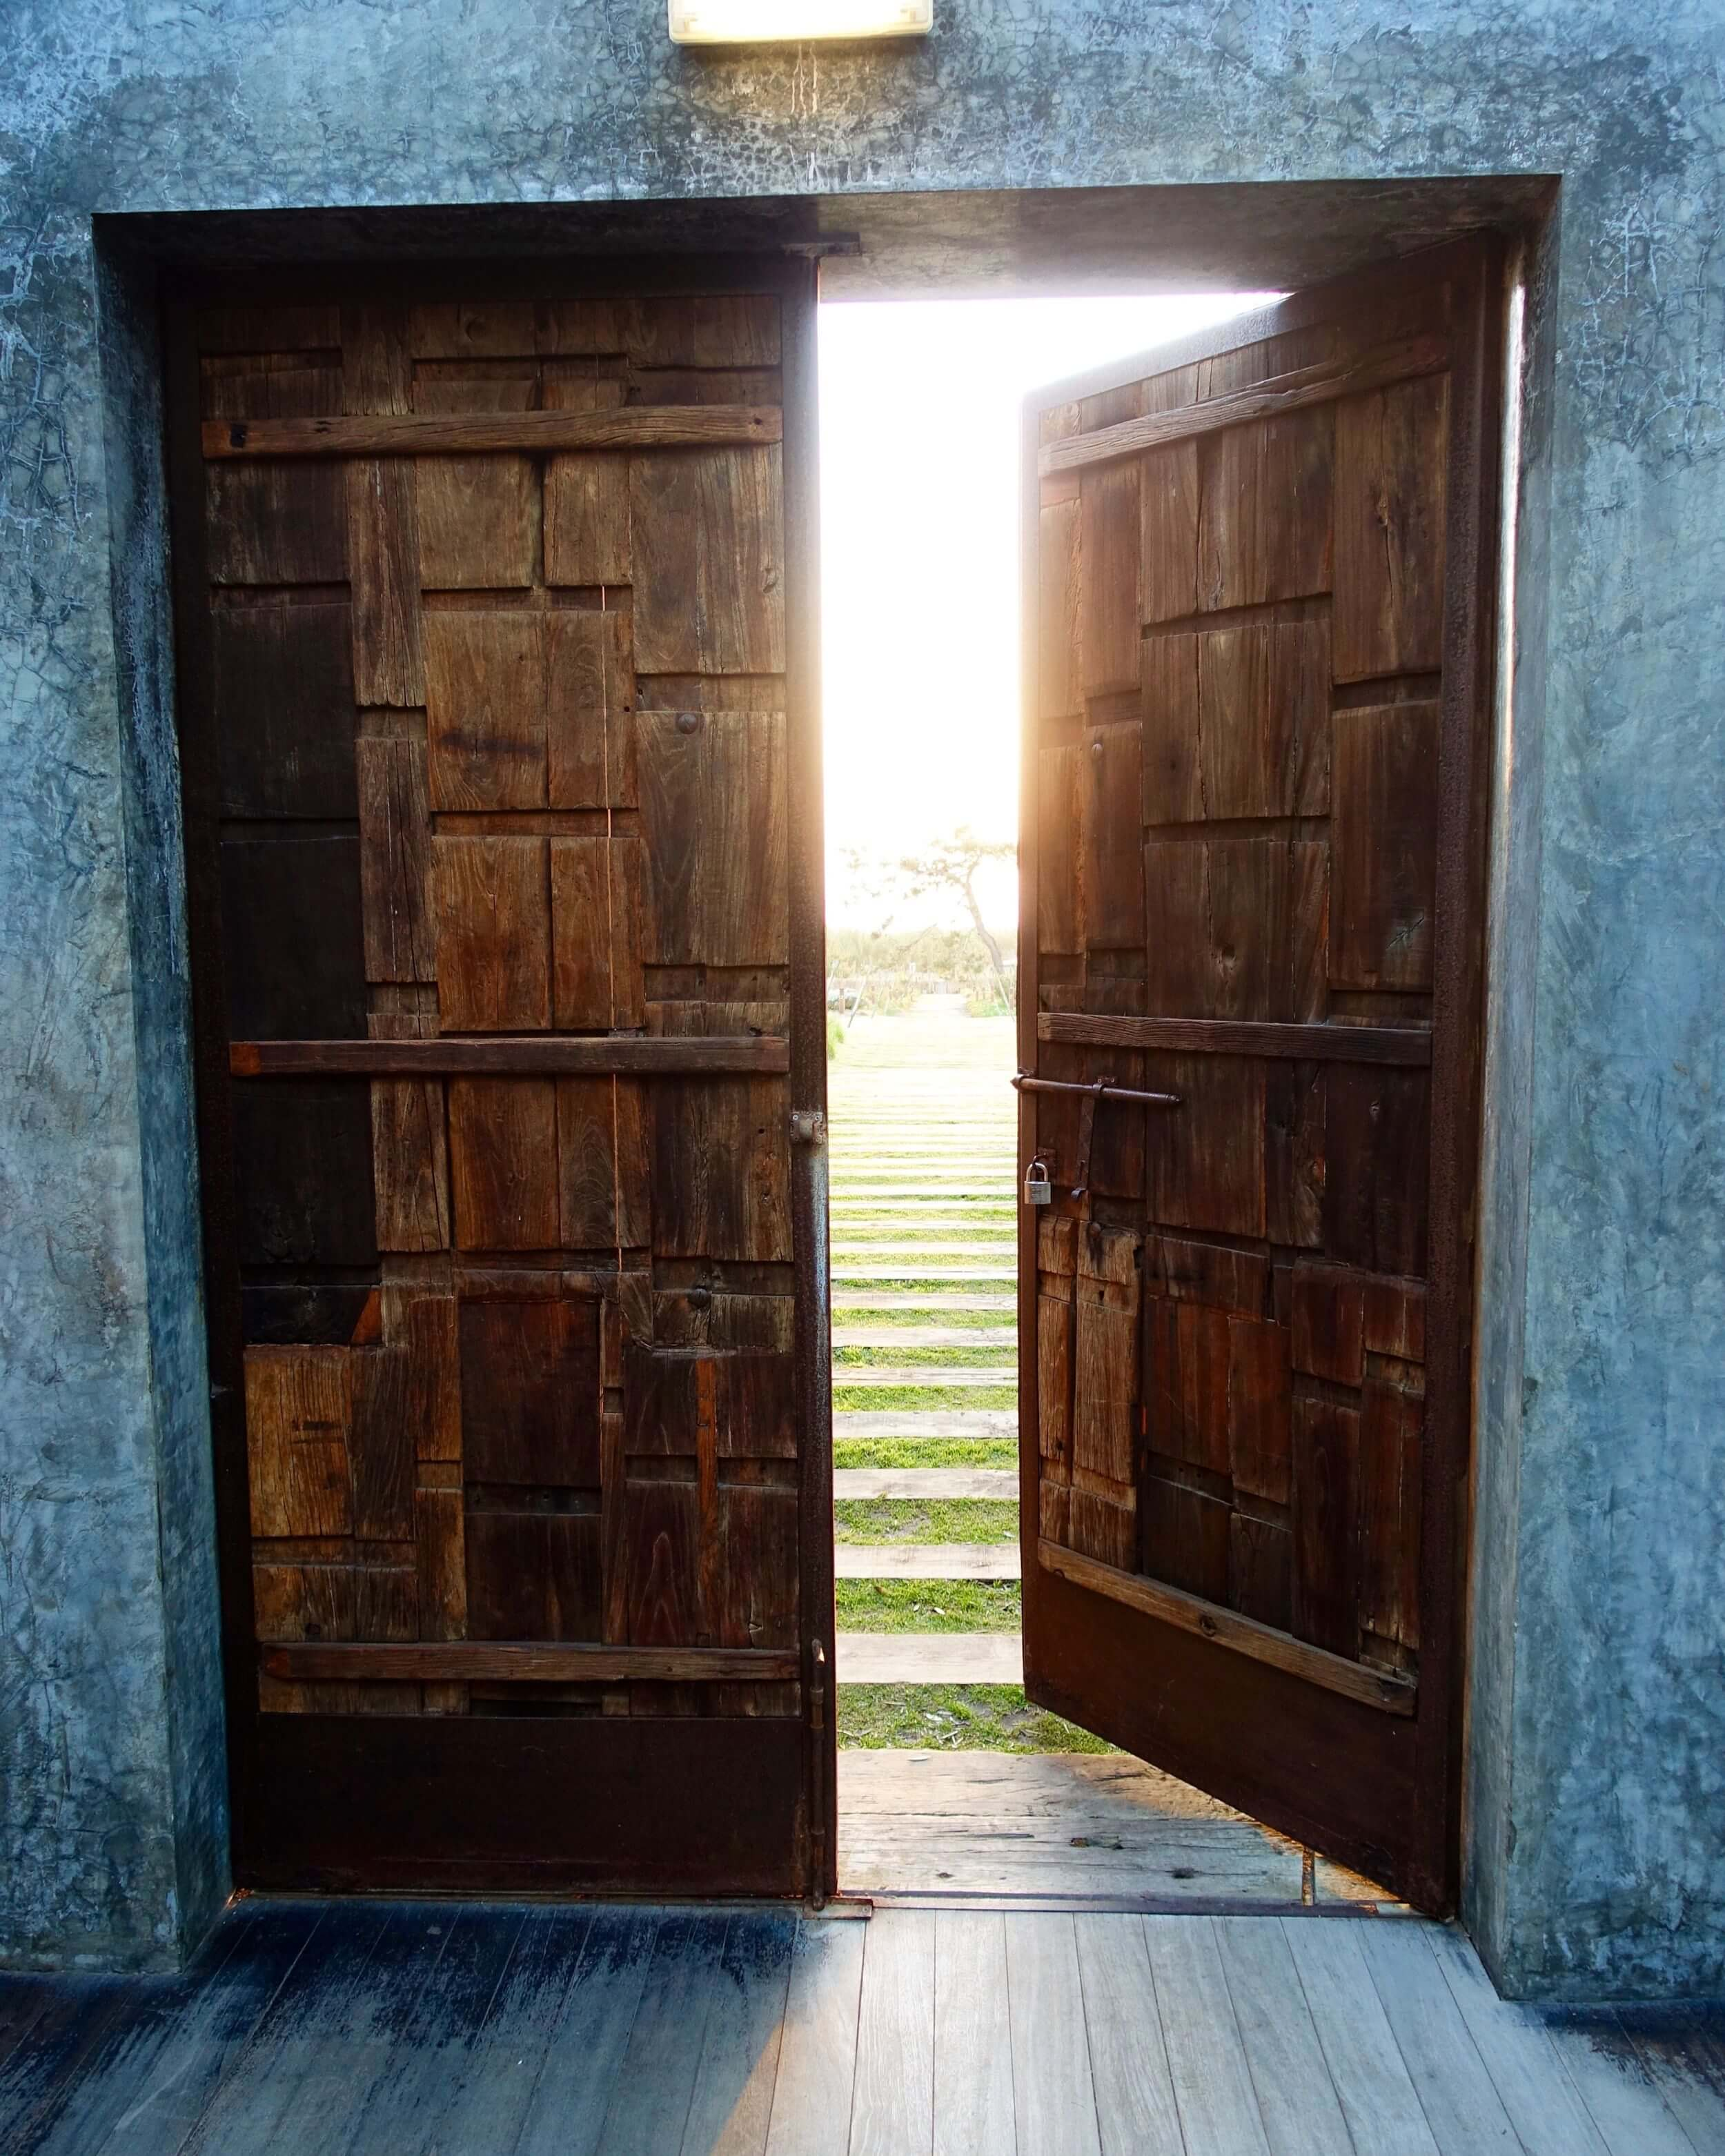 Areias do Seixo doors